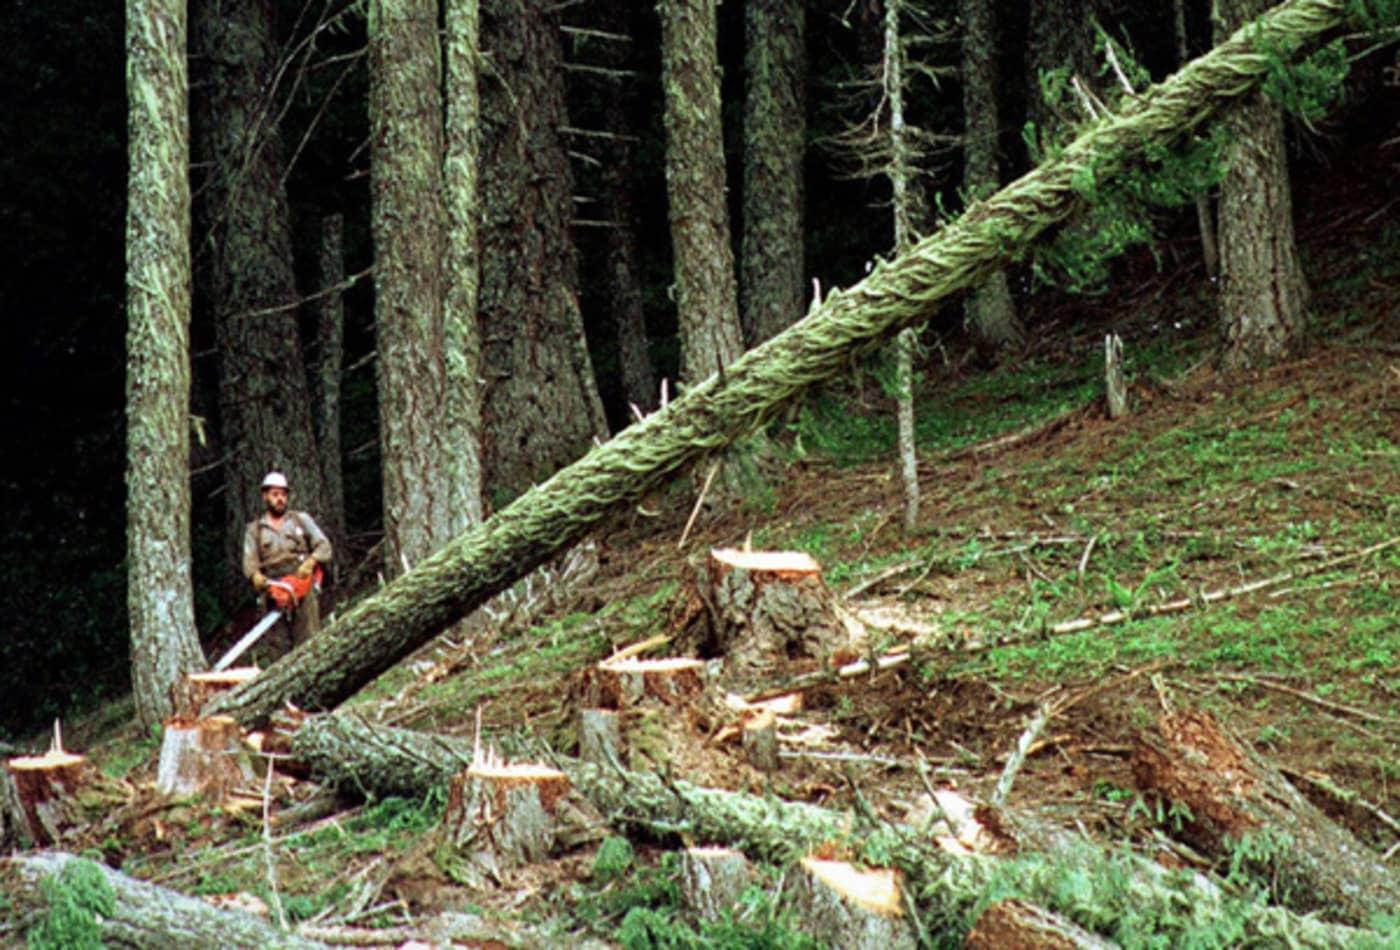 worst-jobs-2012-lumberjack.jpg